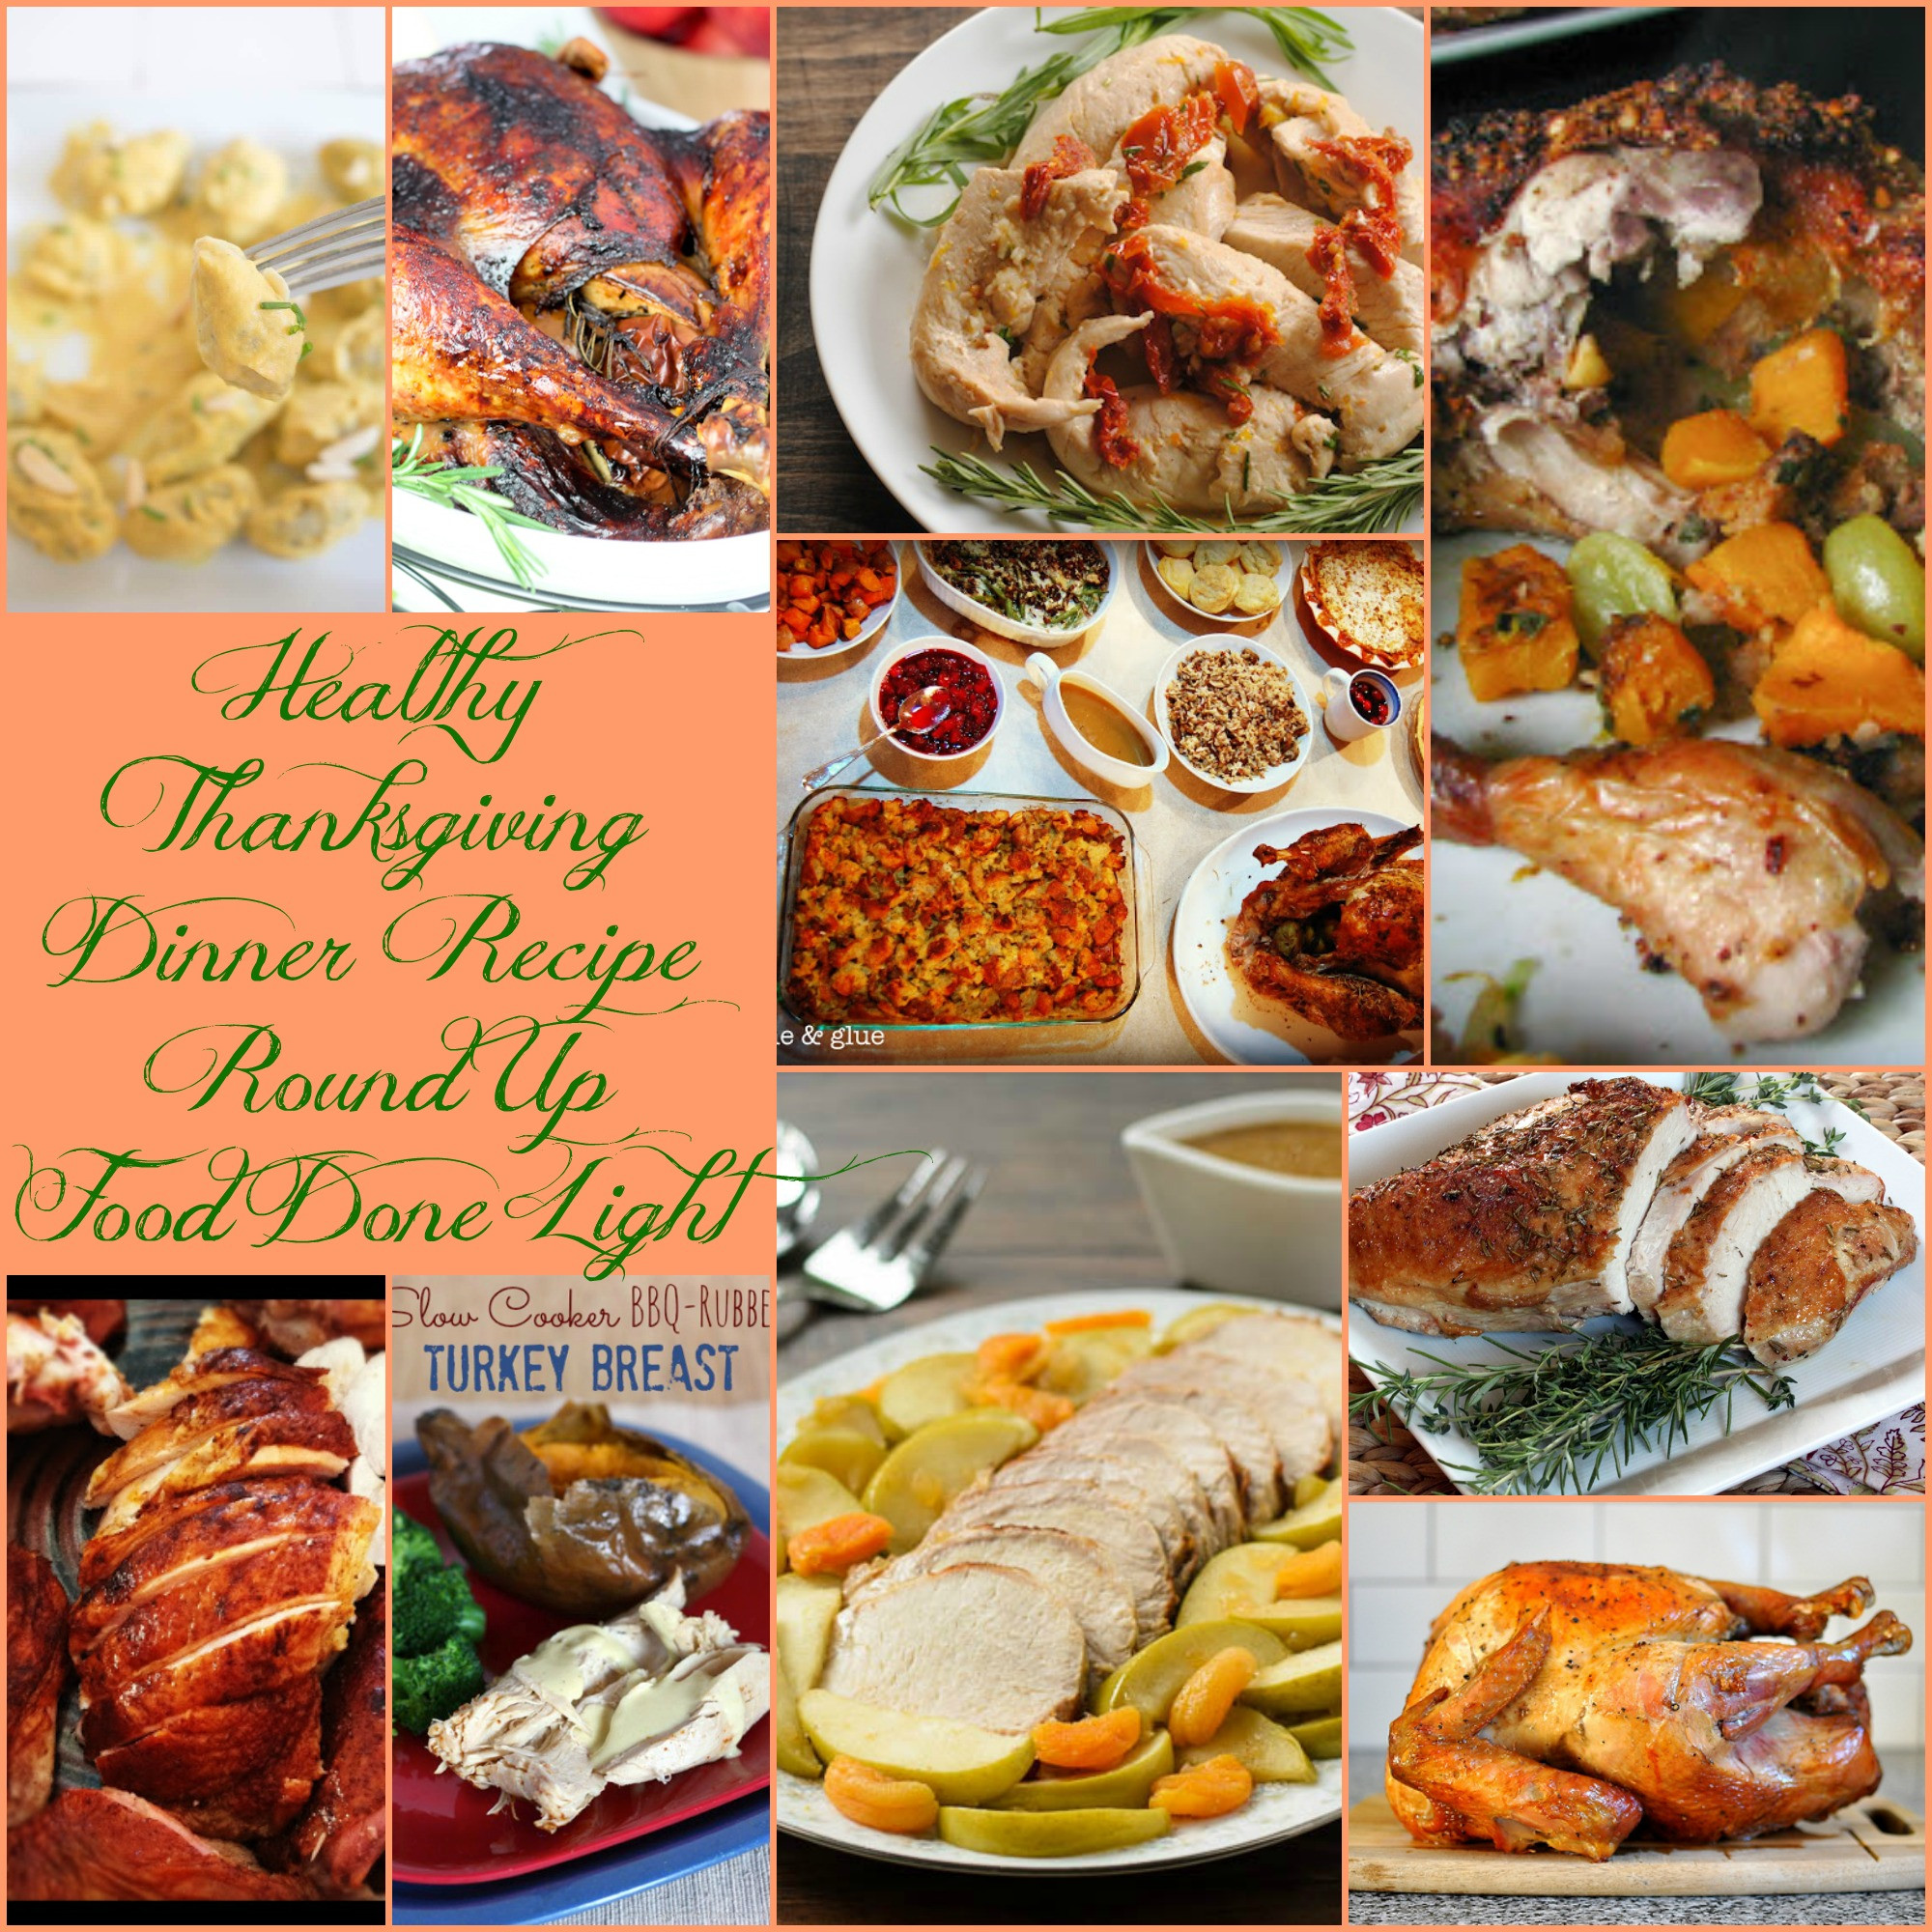 Turkey Recipe For Thanksgiving Dinner  Healthy Thanksgiving Turkey Recipe Round Up Food Done Light